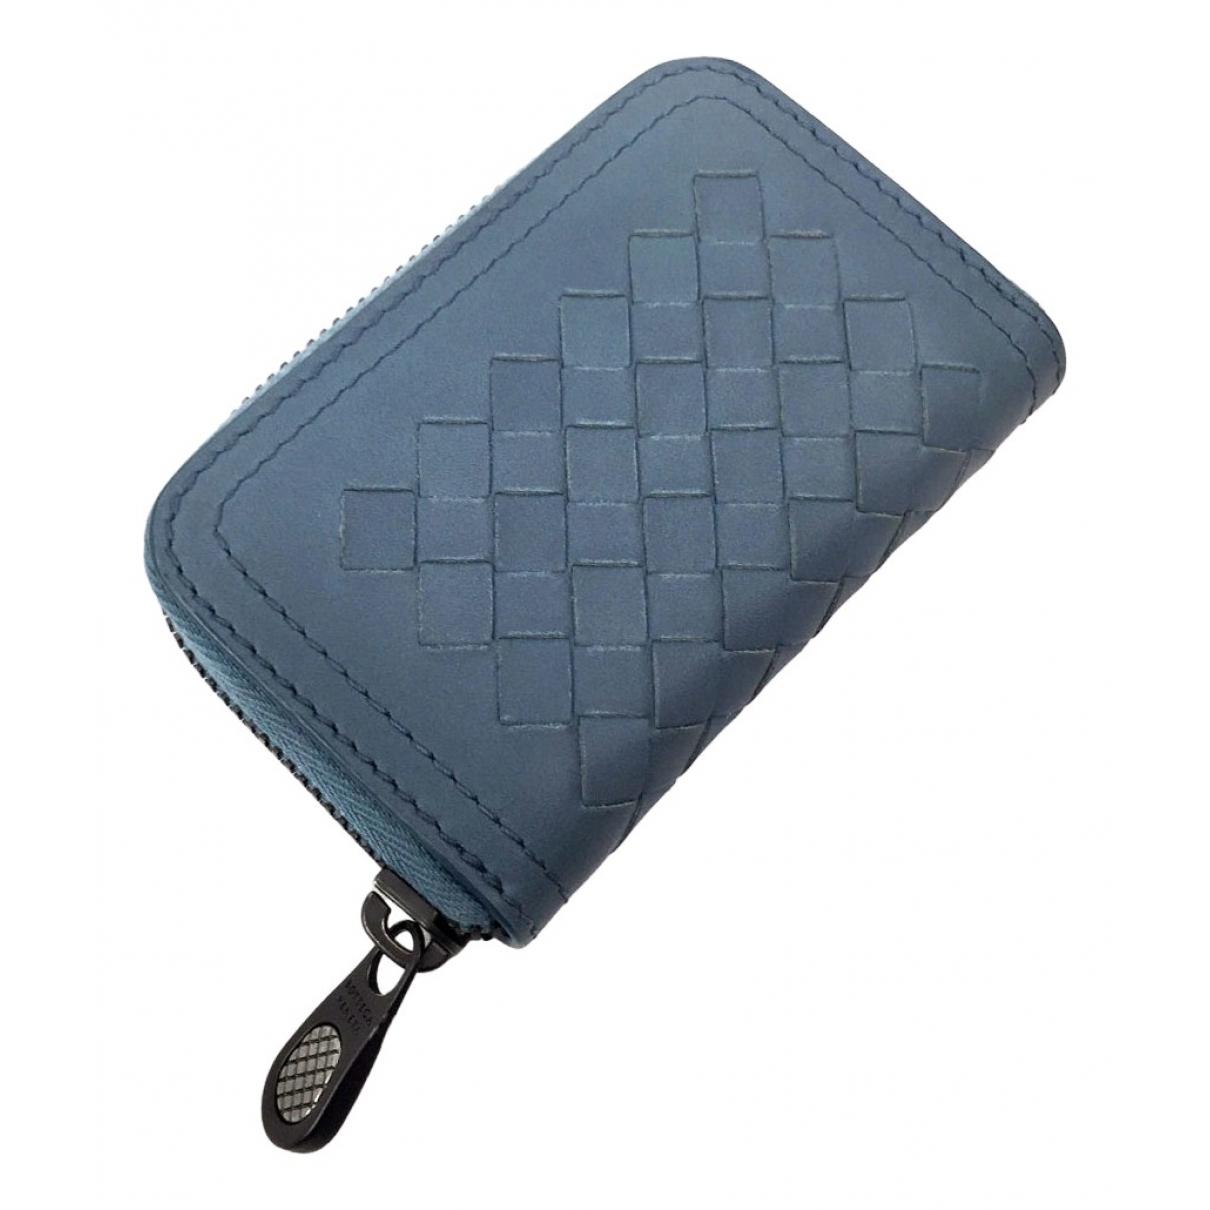 Bottega Veneta Intrecciato Blue Leather wallet for Women N